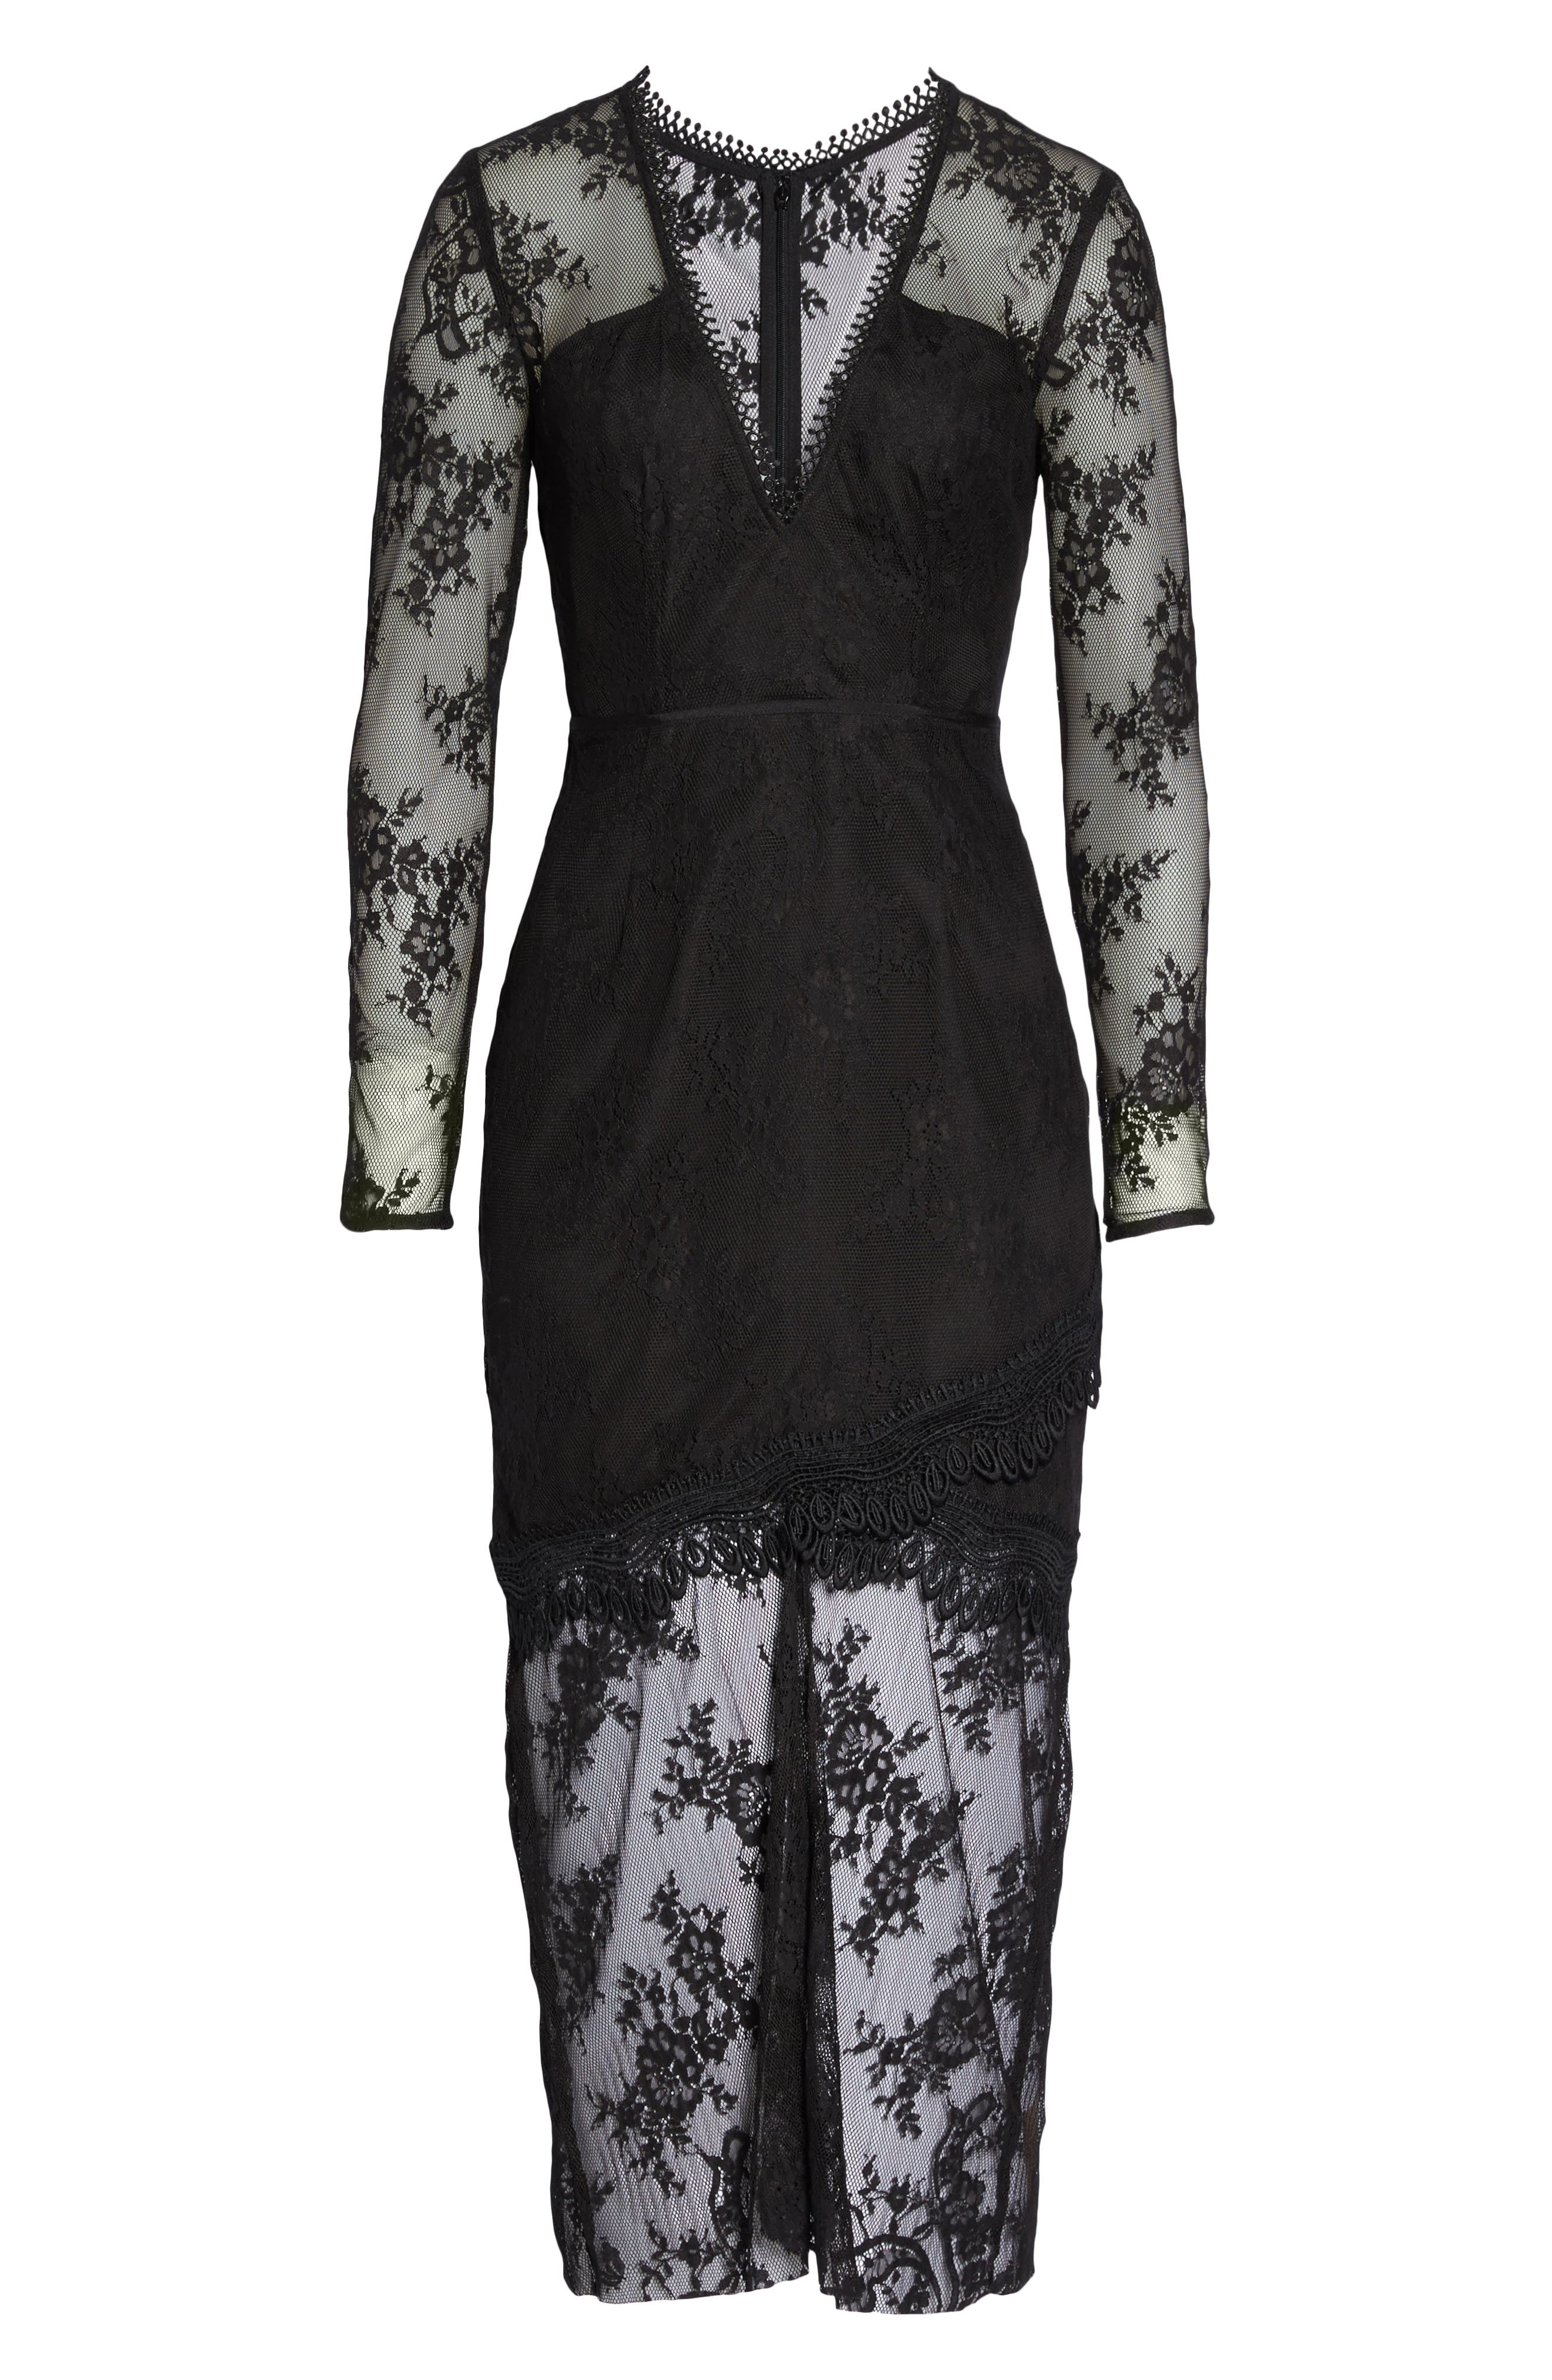 True Chemistry Lace Sheath Dress,                             Alternate thumbnail 6, color,                             Black